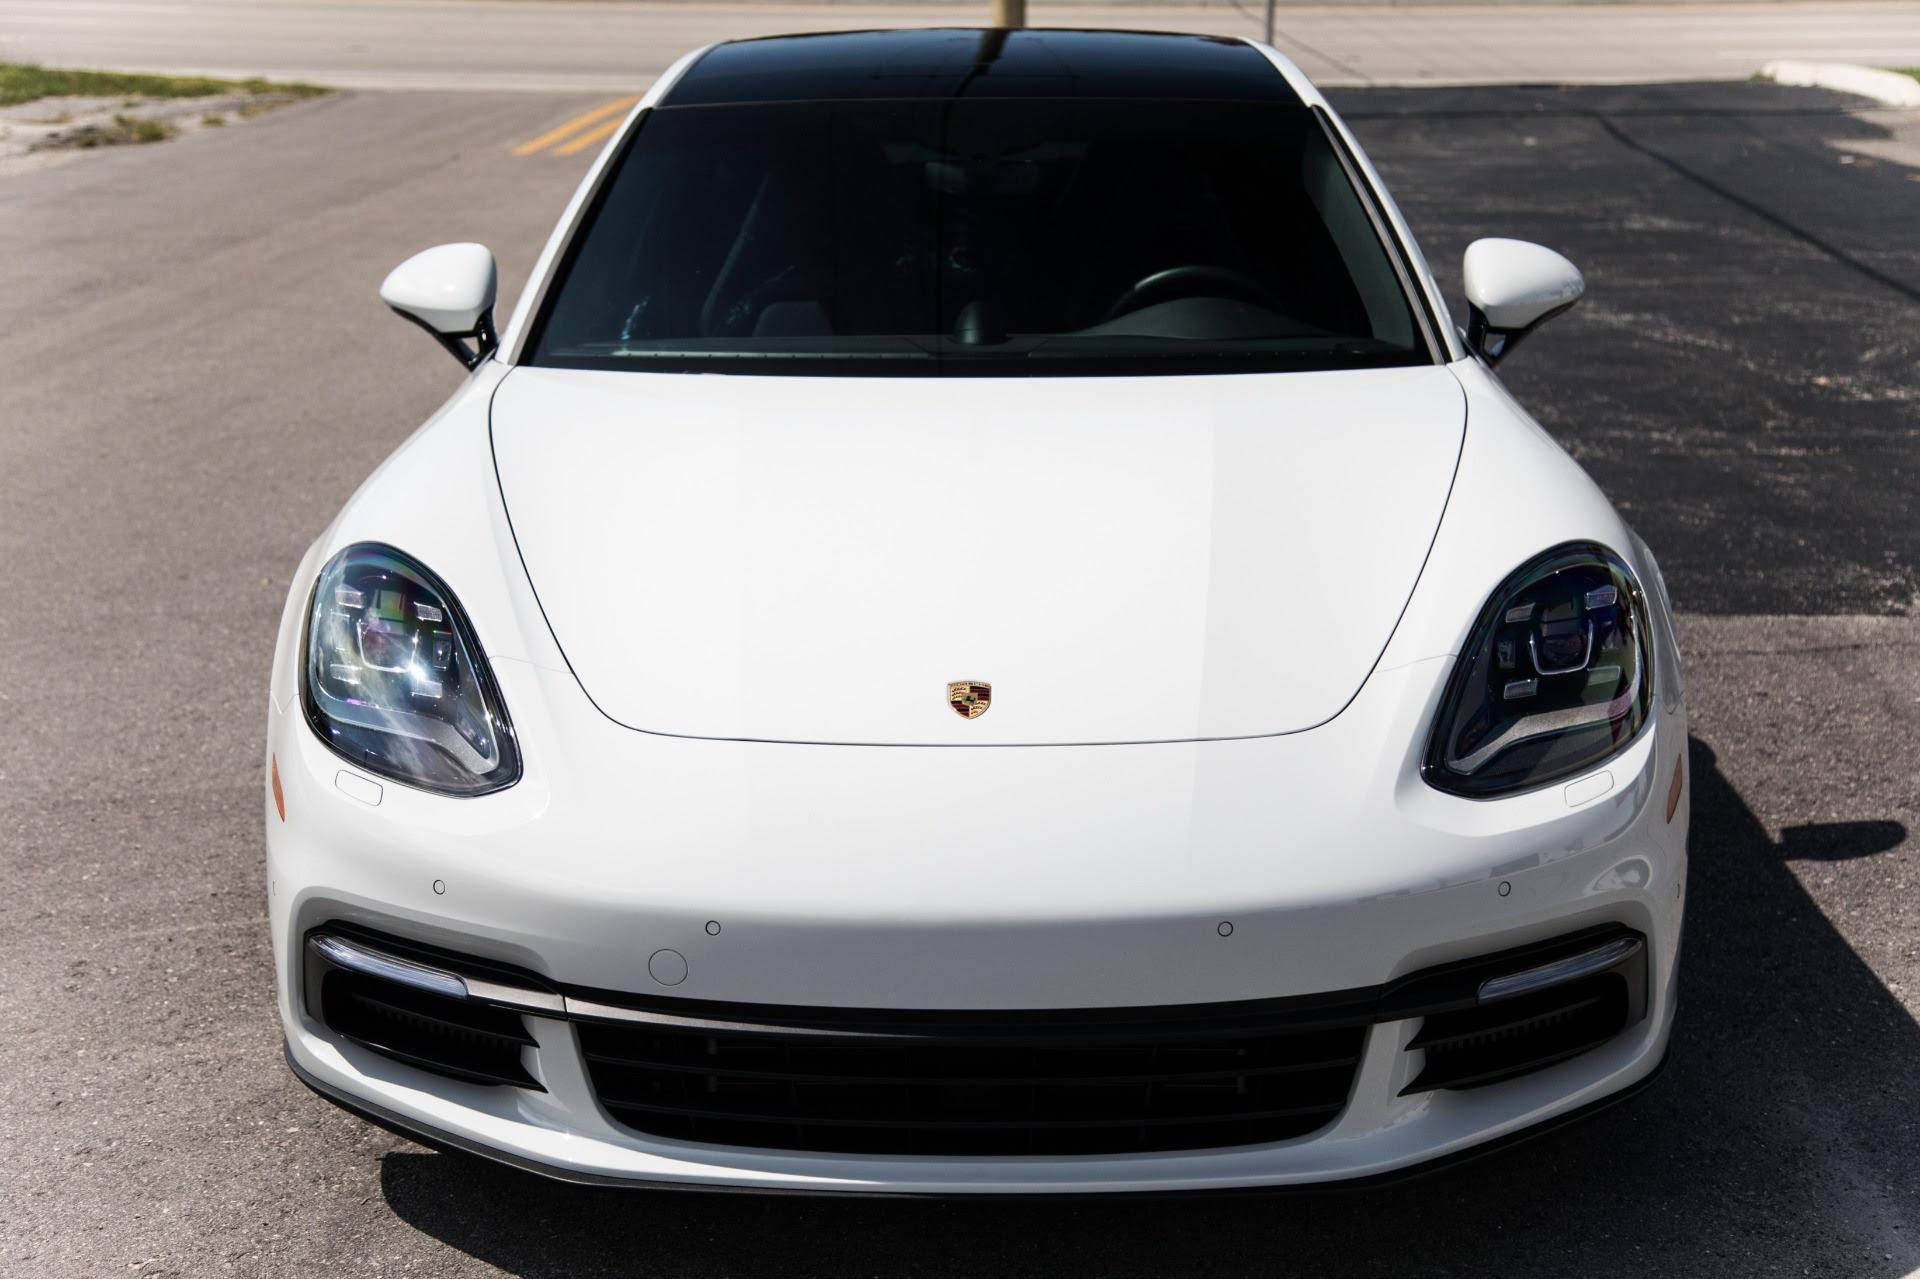 Used 2018 Porsche Panamera 4S For Sale ($89,900)   Marino Performance Motors Stock #134164